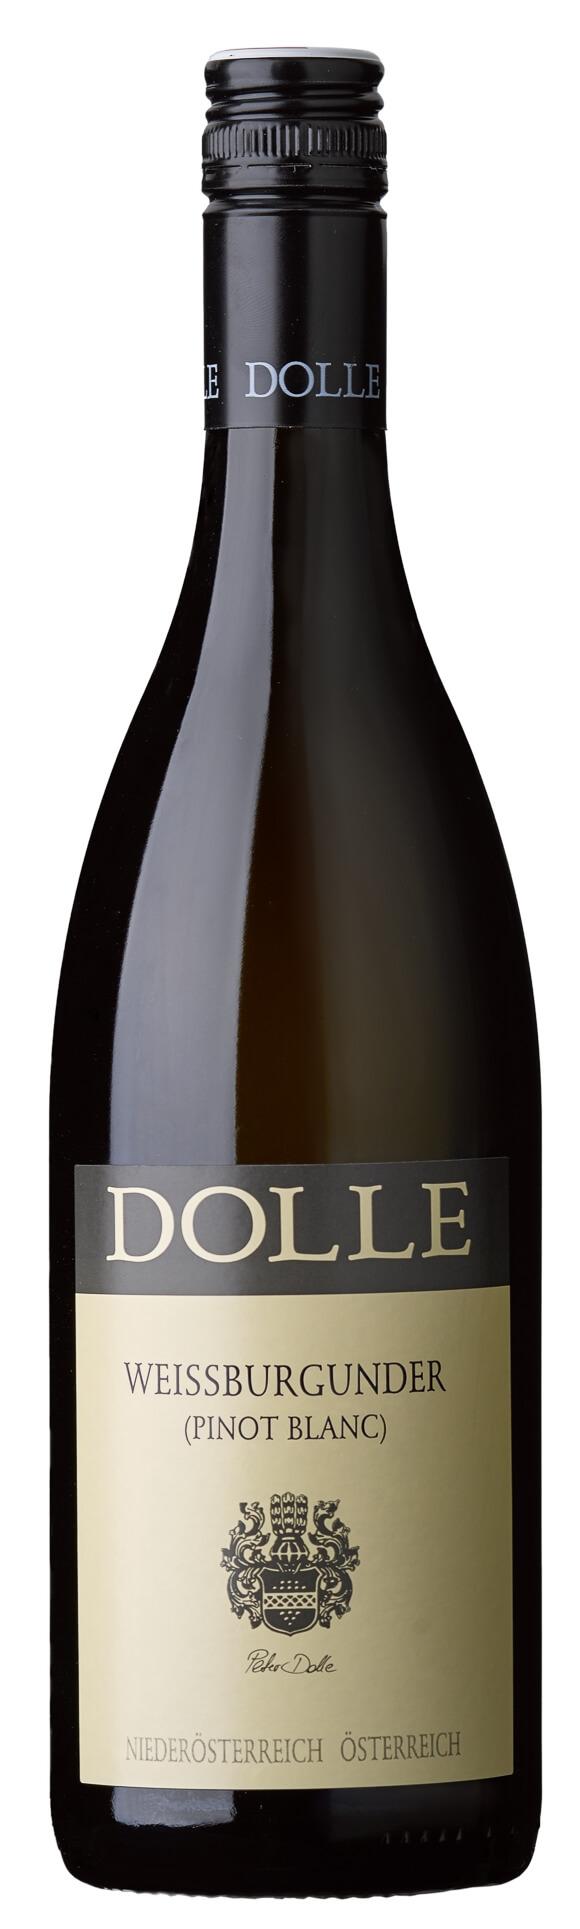 Weißburgunder Pinot Blanc 2018 / Peter Dolle